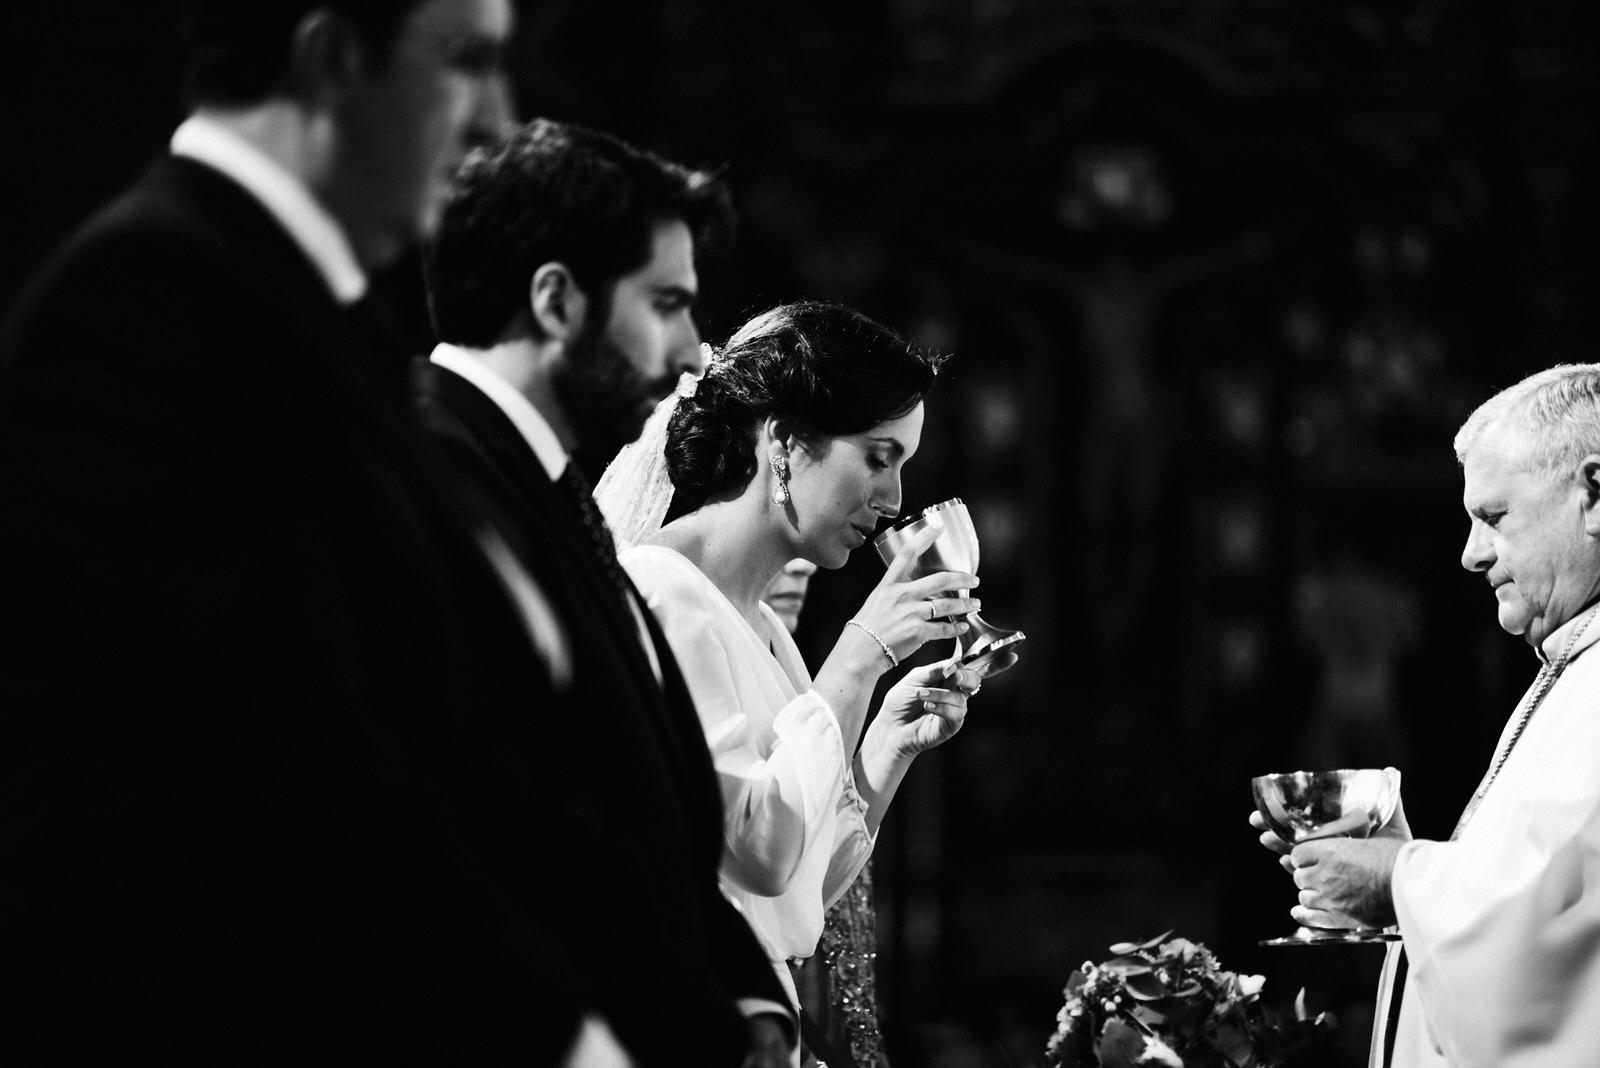 fotografo de bodas sevilla - fotografo boda - fotografía sevilla - Andrés AmarilloAAA_5010- tele-2- fine.JPG